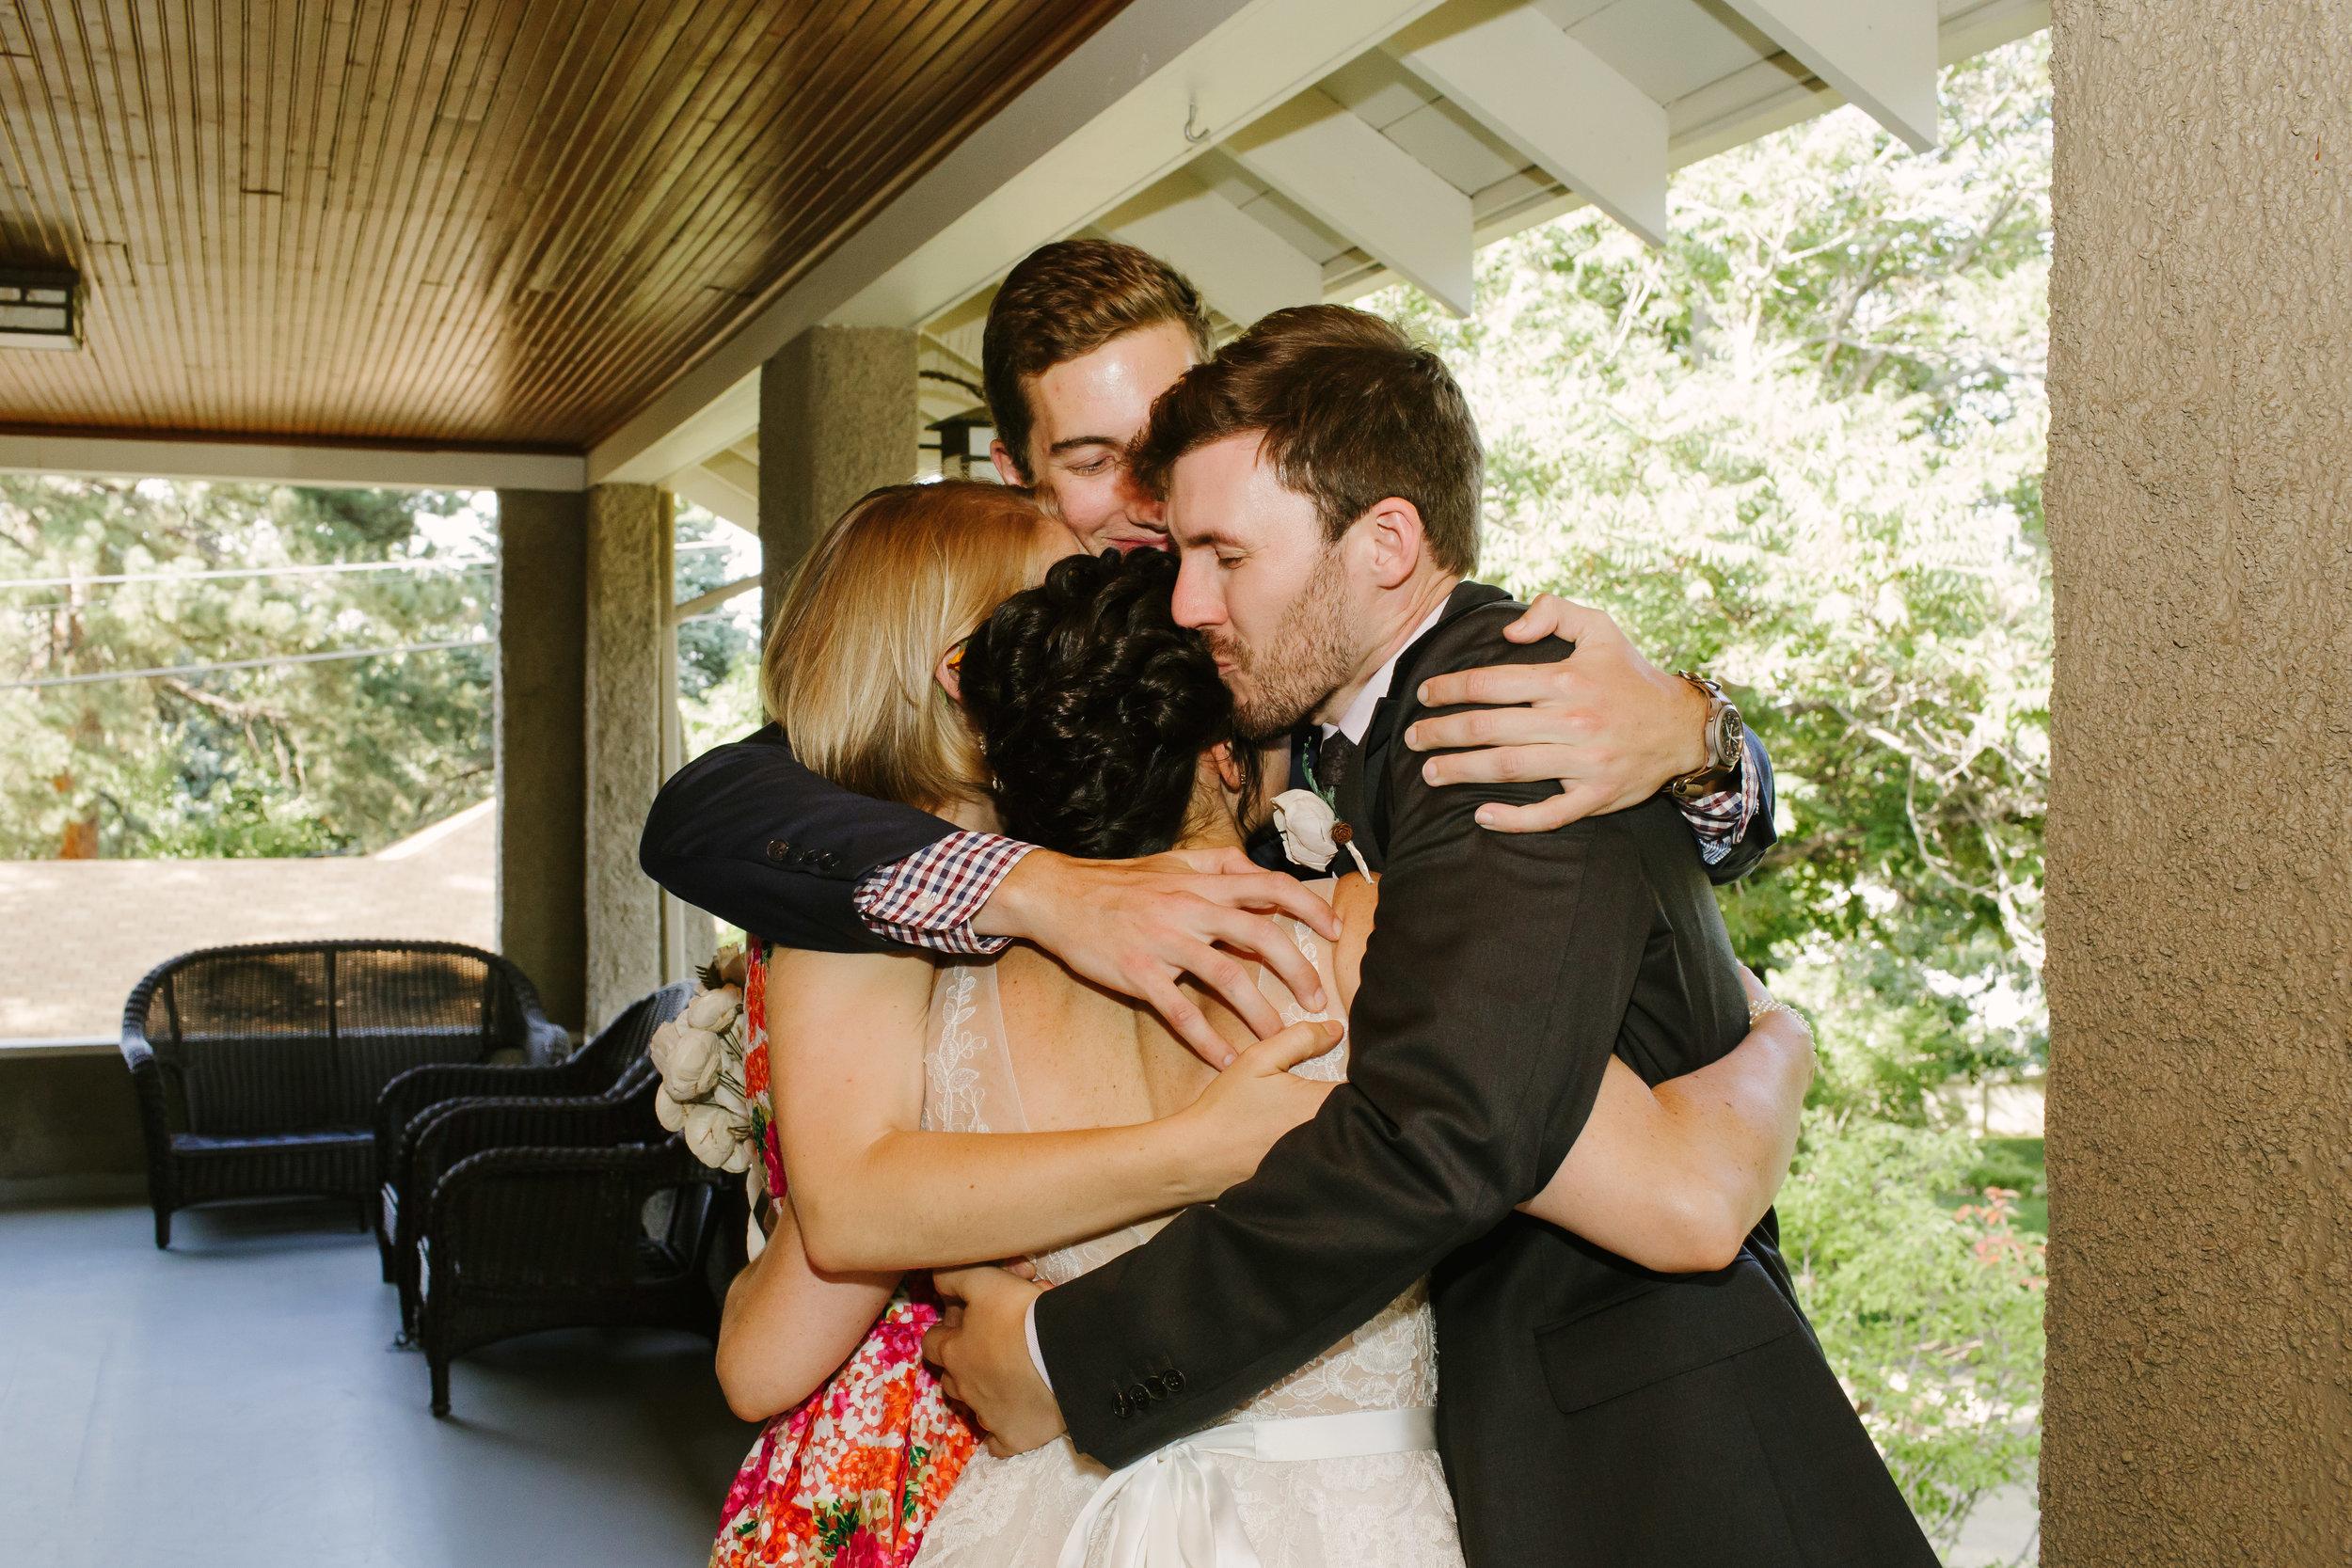 Family Celebrates Wedding at Chautauqua Grand Assembly